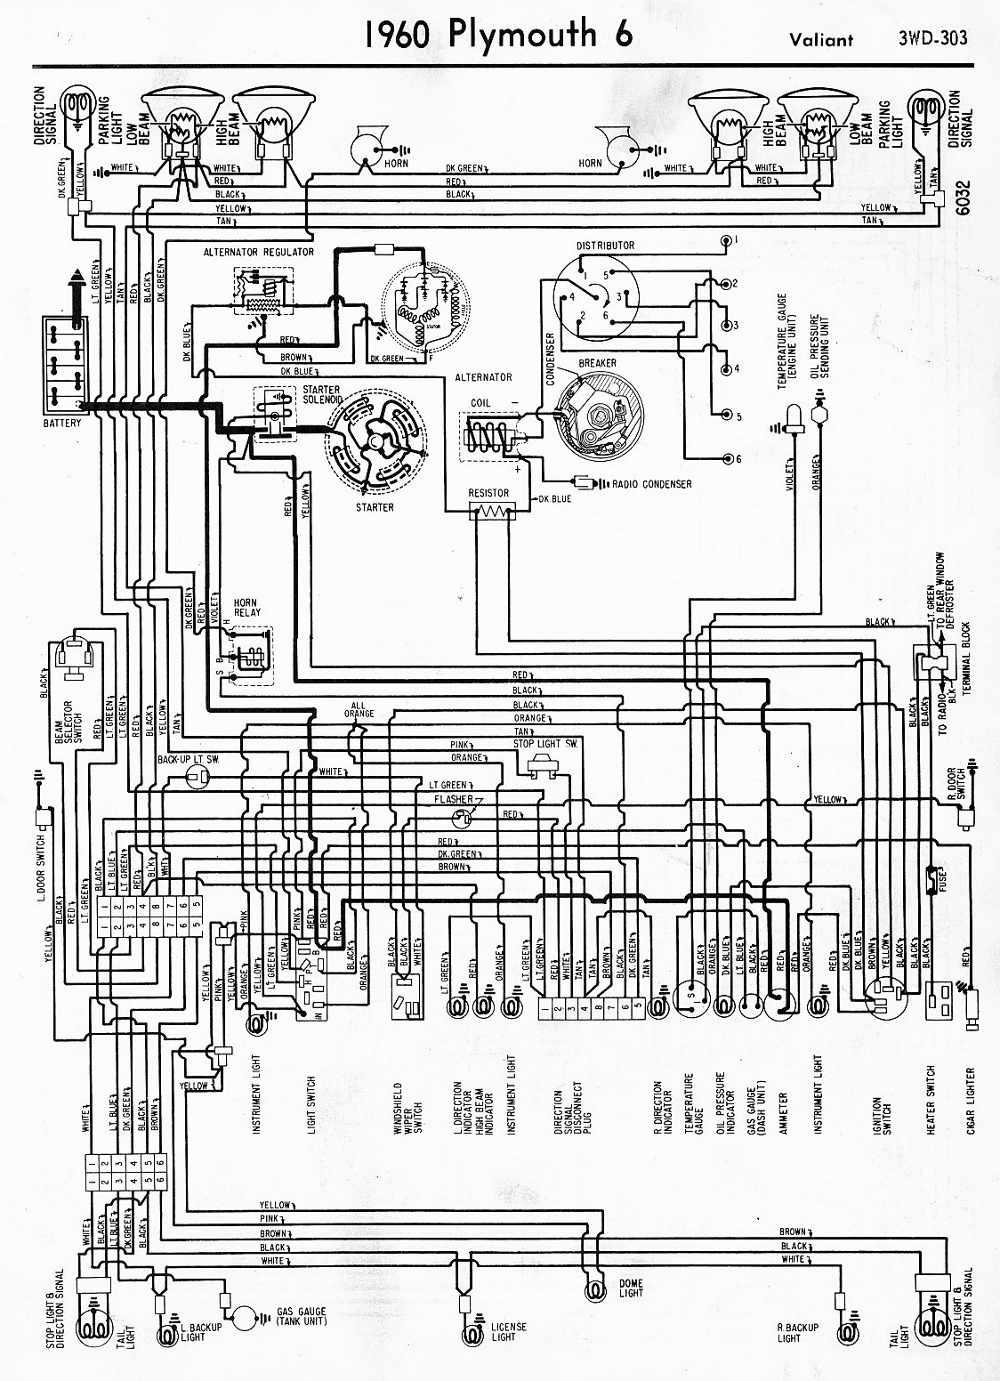 1994 Plymouth Acclaim Radio Wiring Diagram Schematic Diagrams Sundance Free Download Mercury Topaz